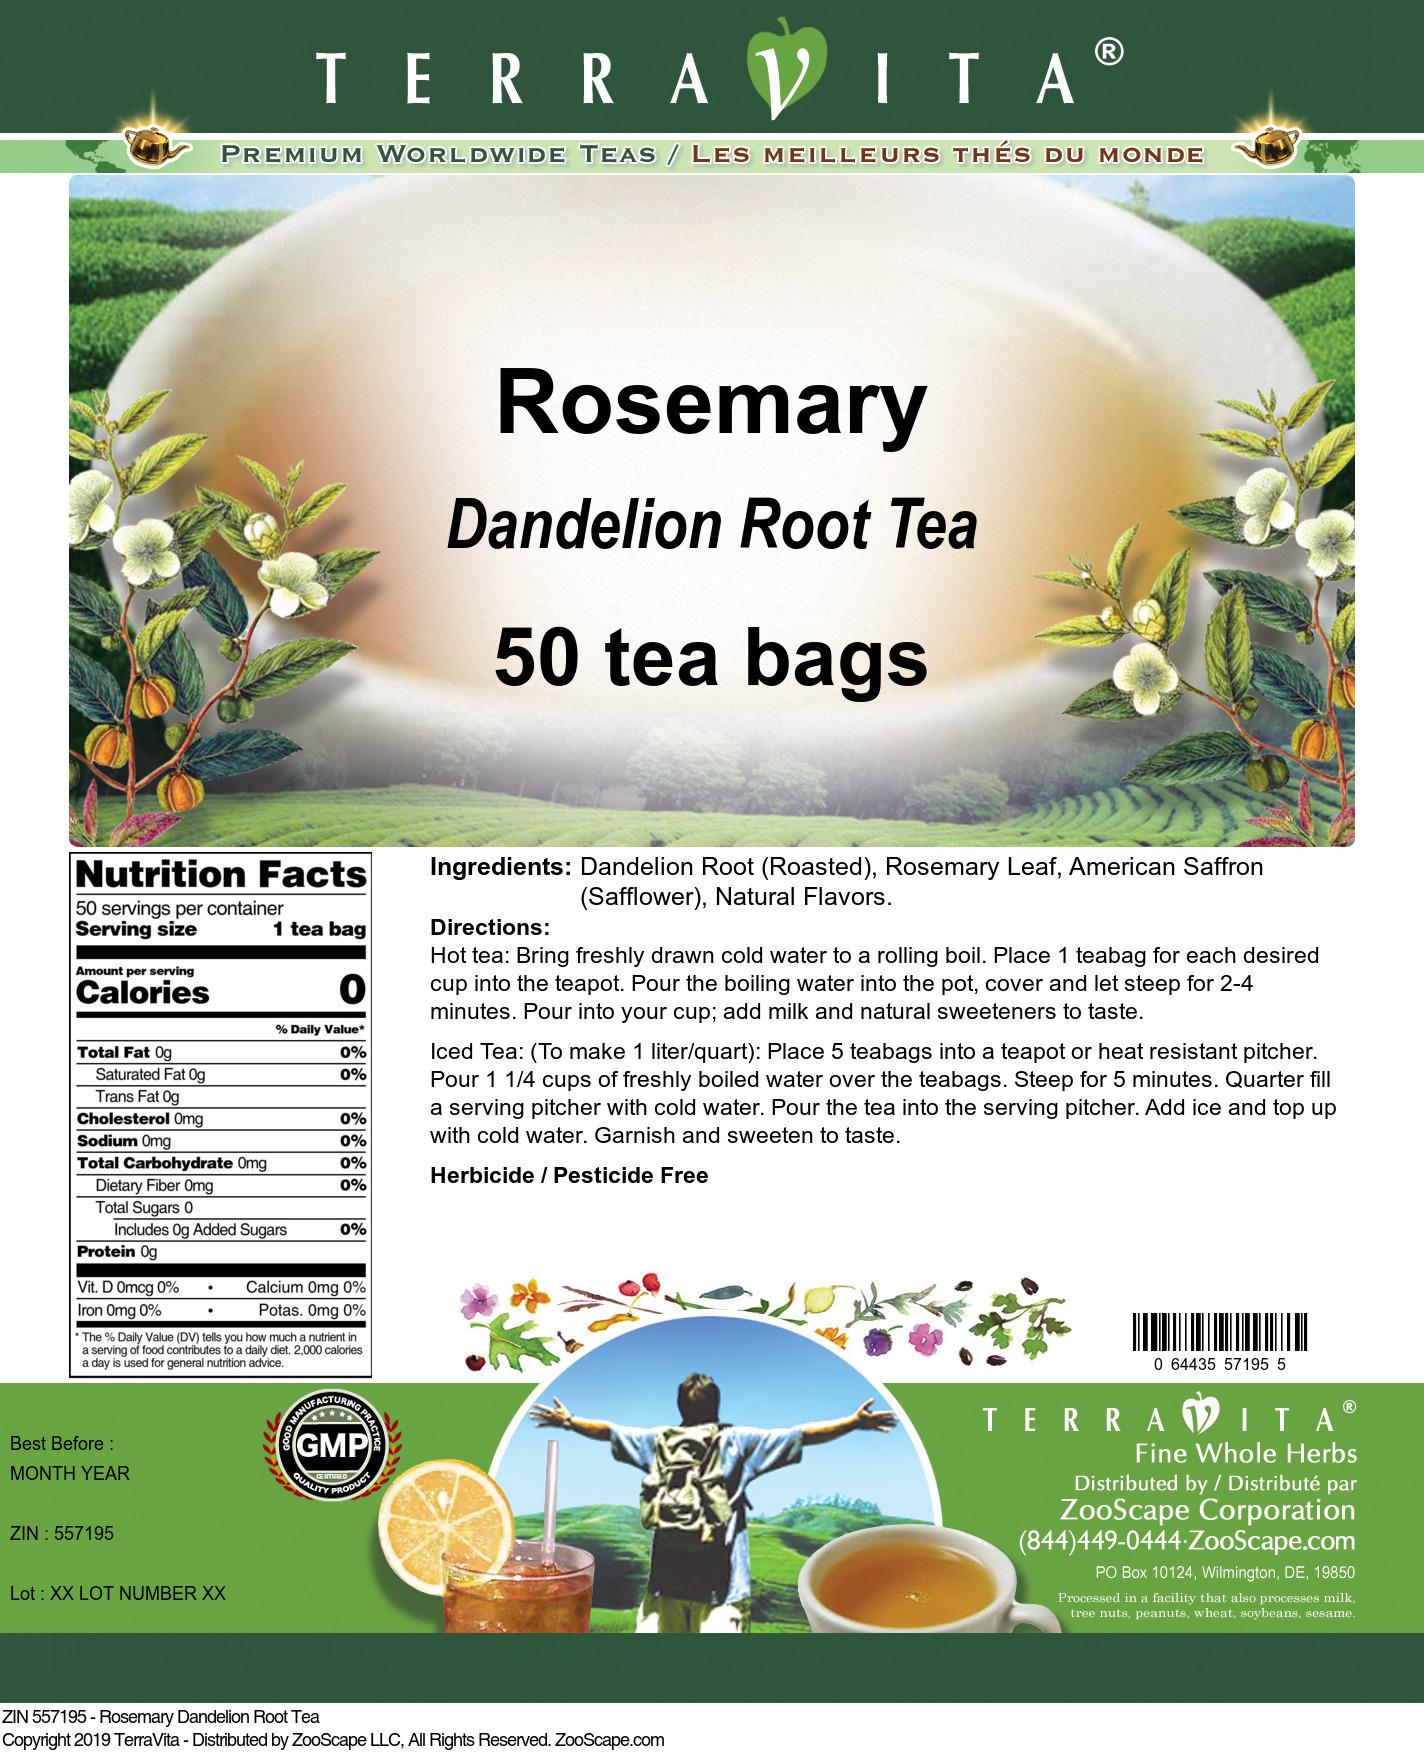 Rosemary Dandelion Root Tea